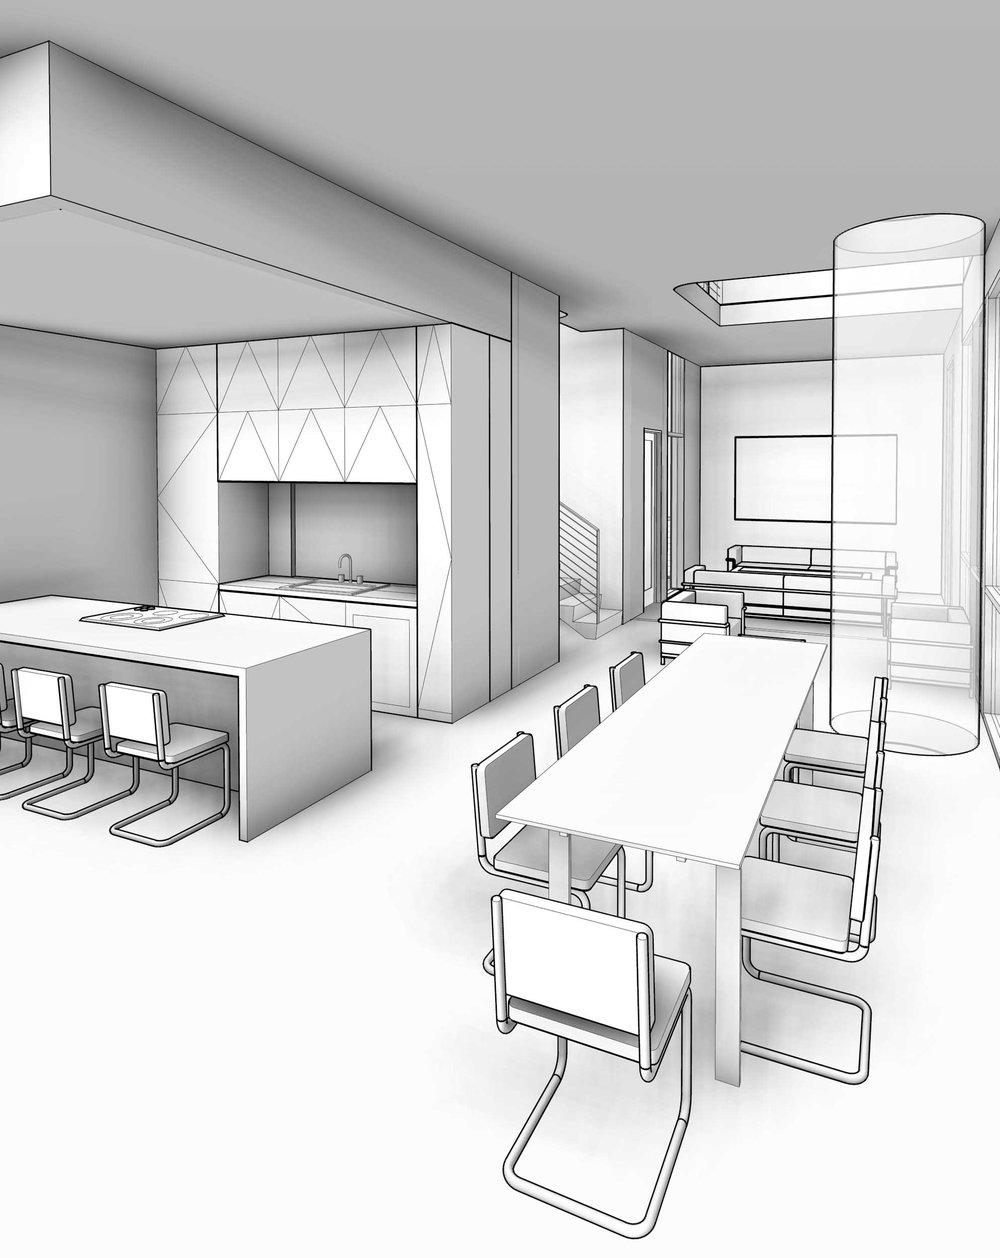 McKenzie Design | Grayscale